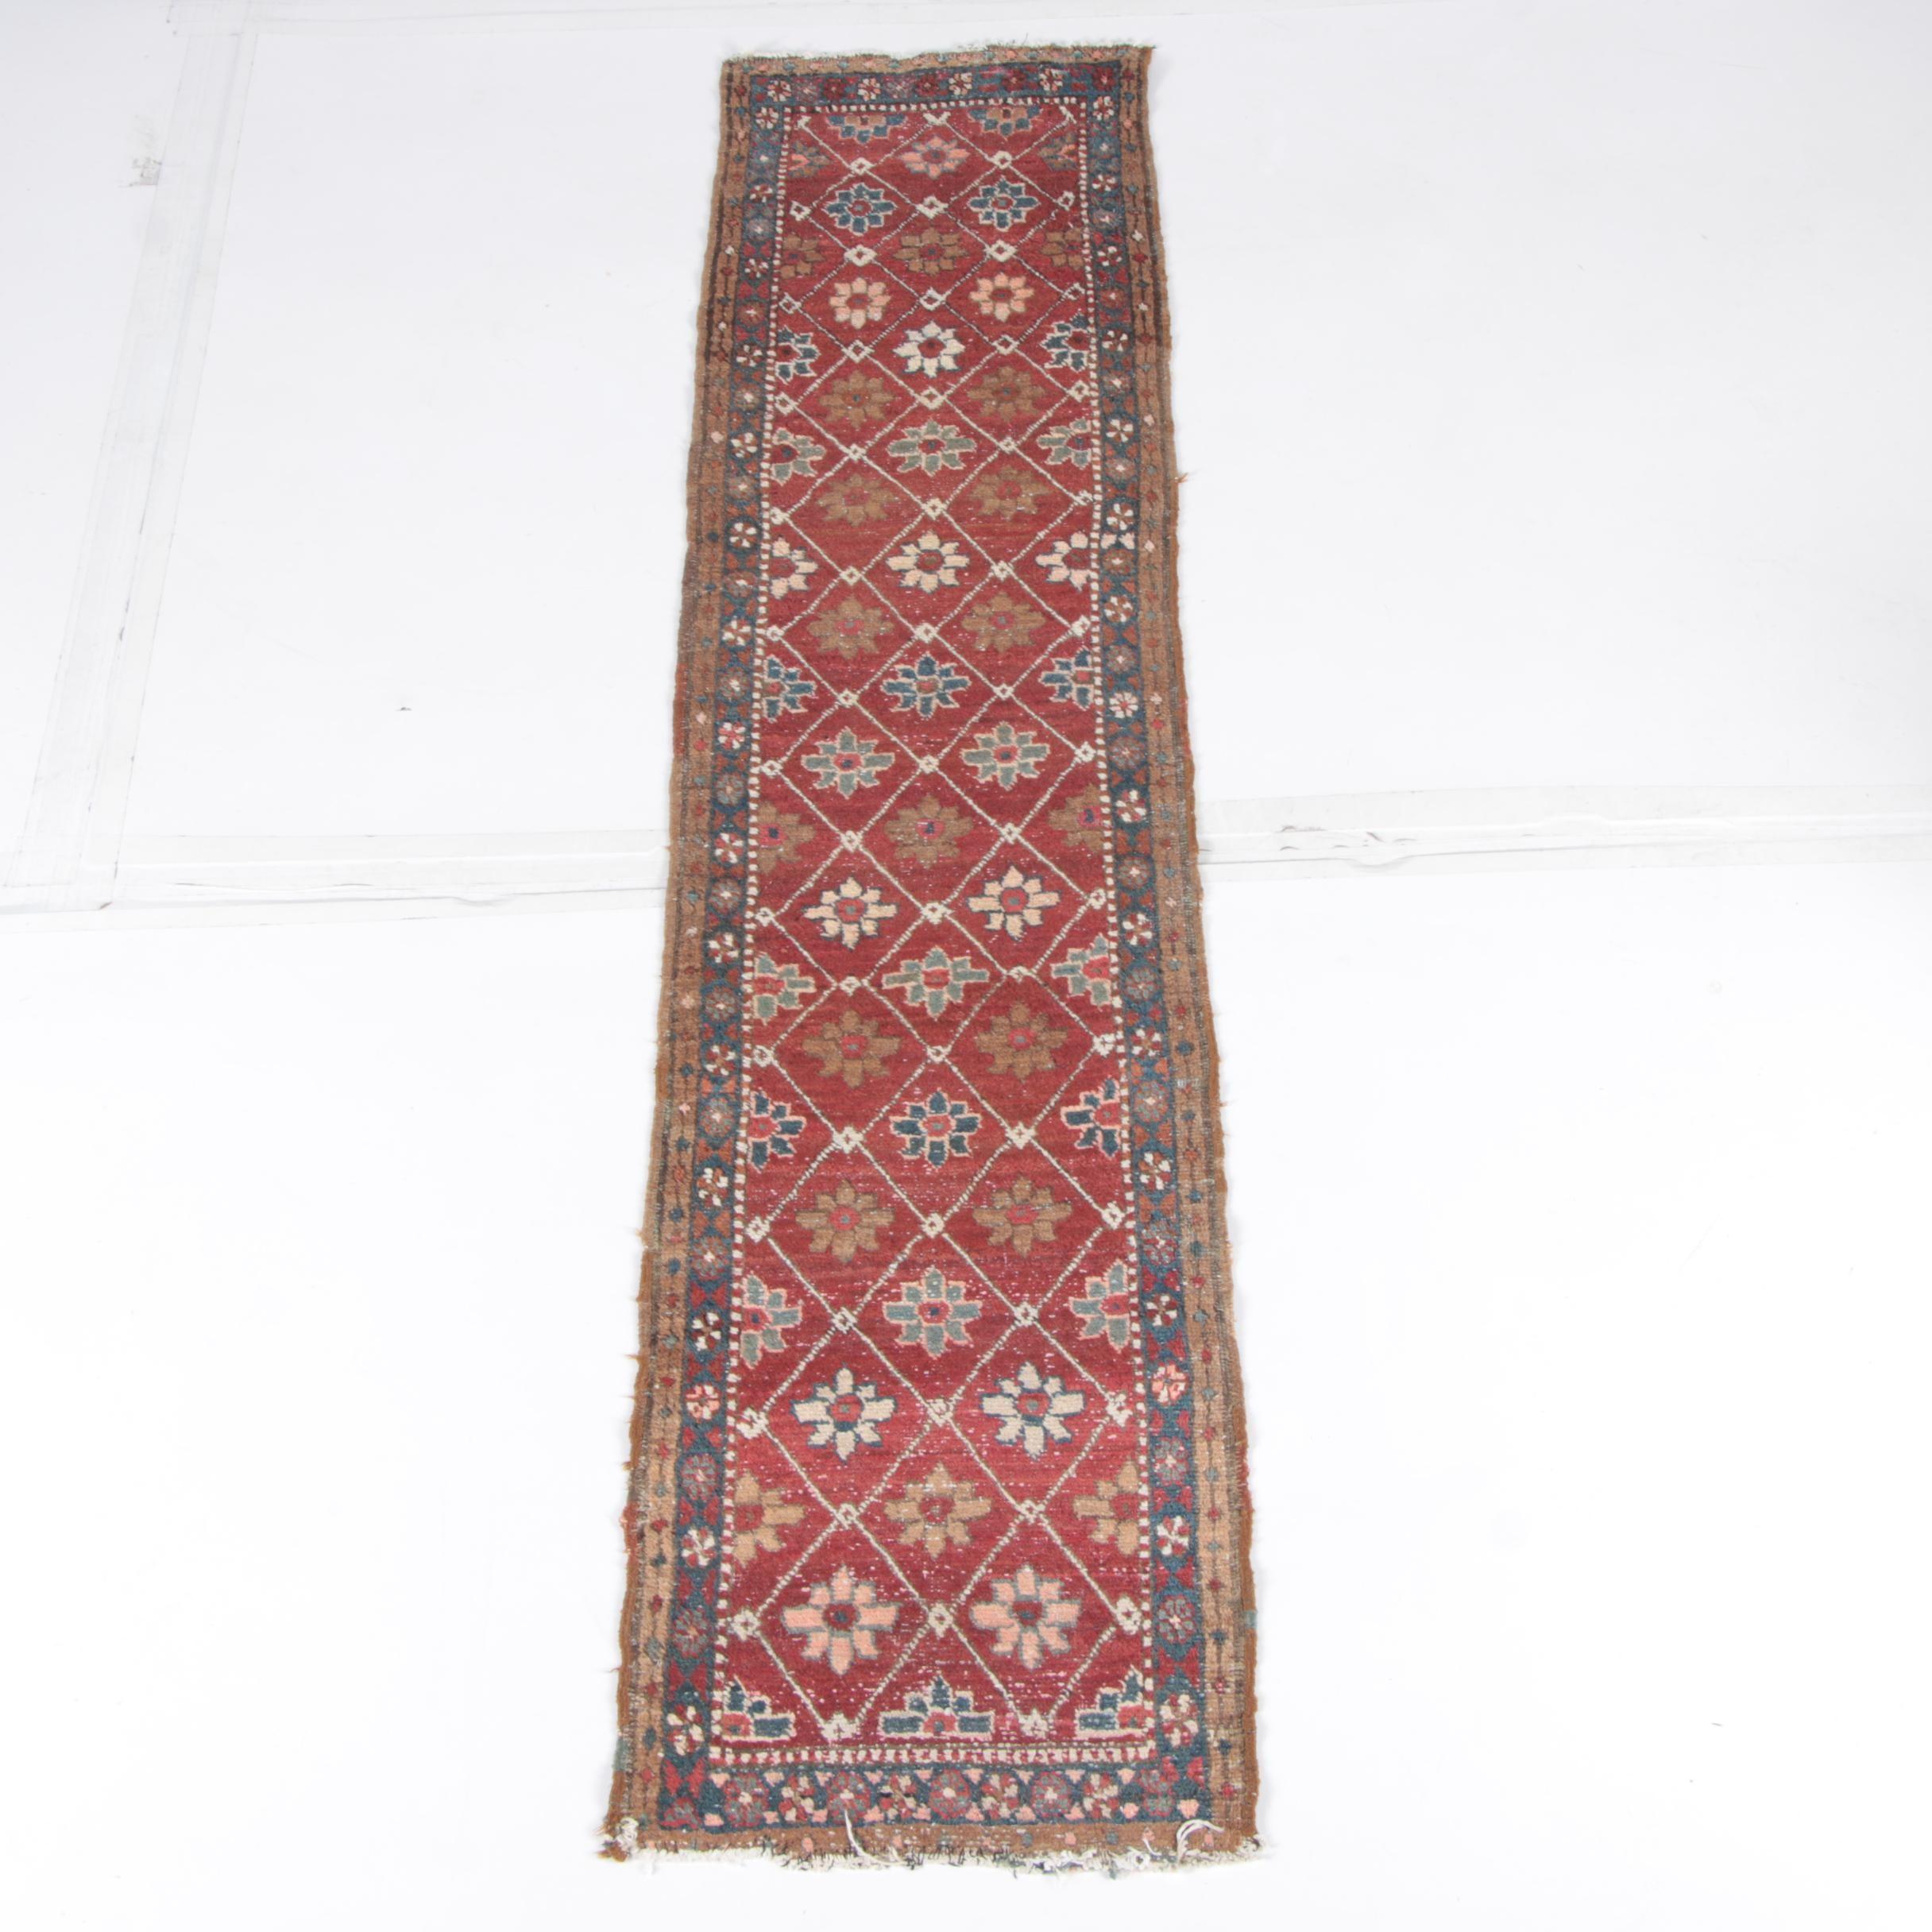 Hand-Knotted Caucasian  Lattice Carpet Runner